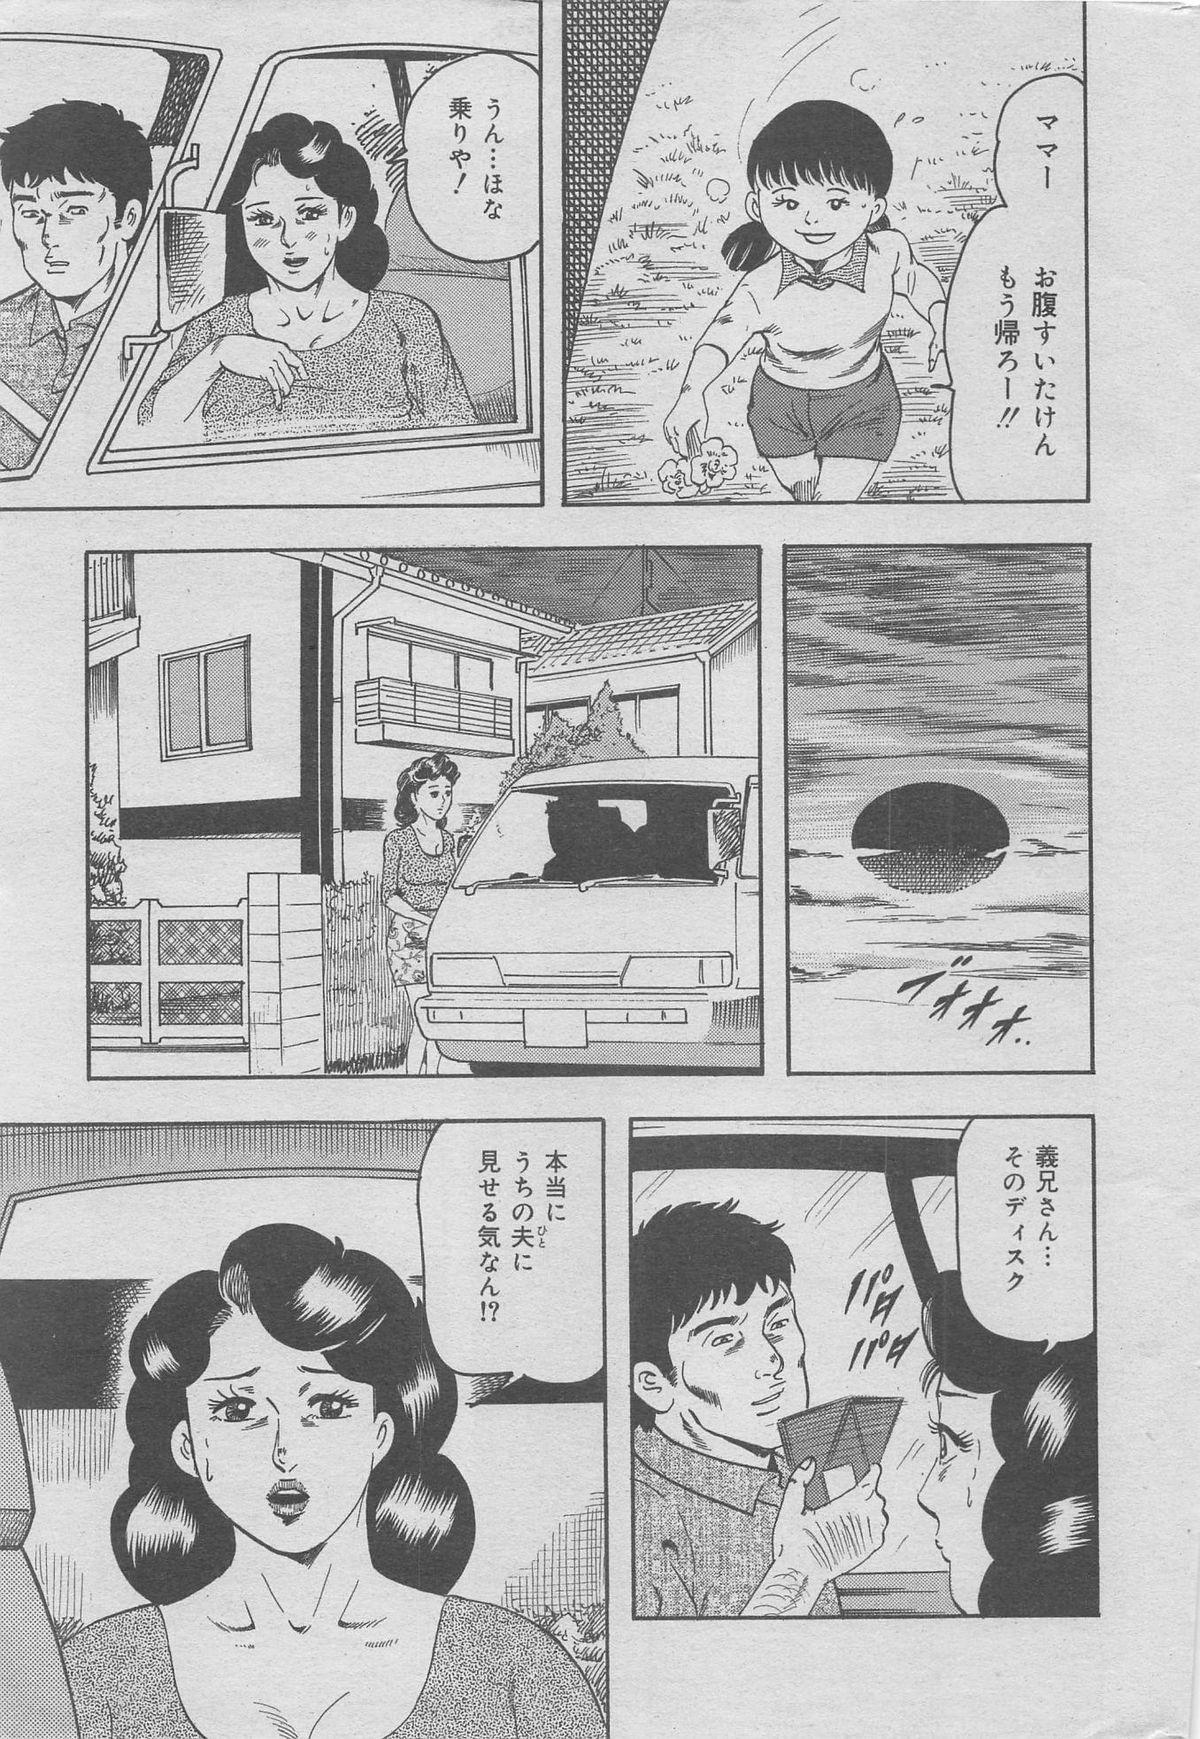 Hontou ni Atta Kindanai vol.7 6